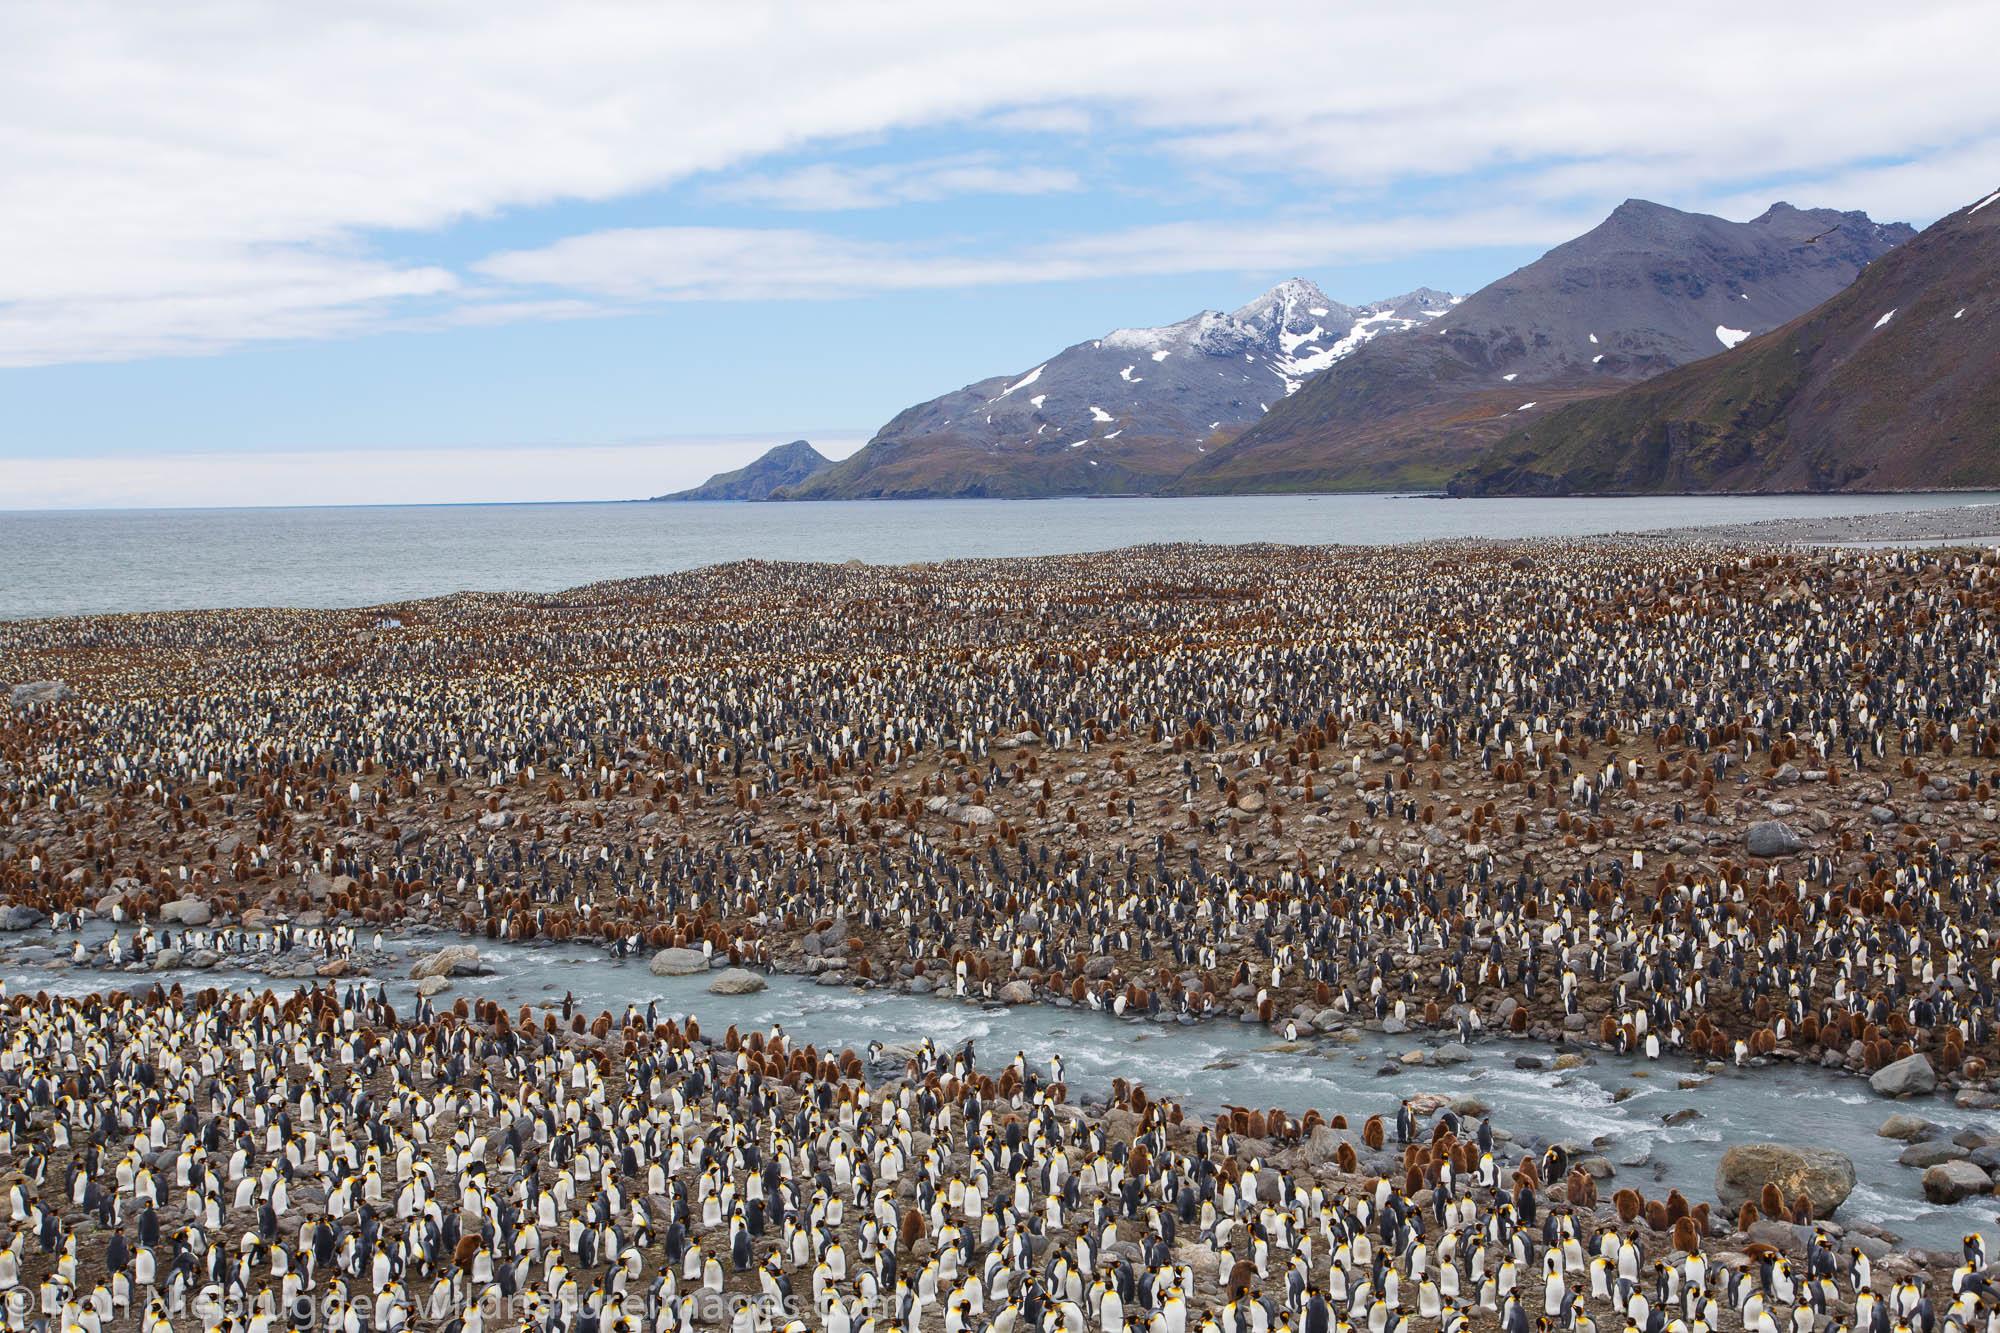 King penguins (Aptenodytes patagonicus), Saint Andrews Bay, South Georgia, Antarctica.